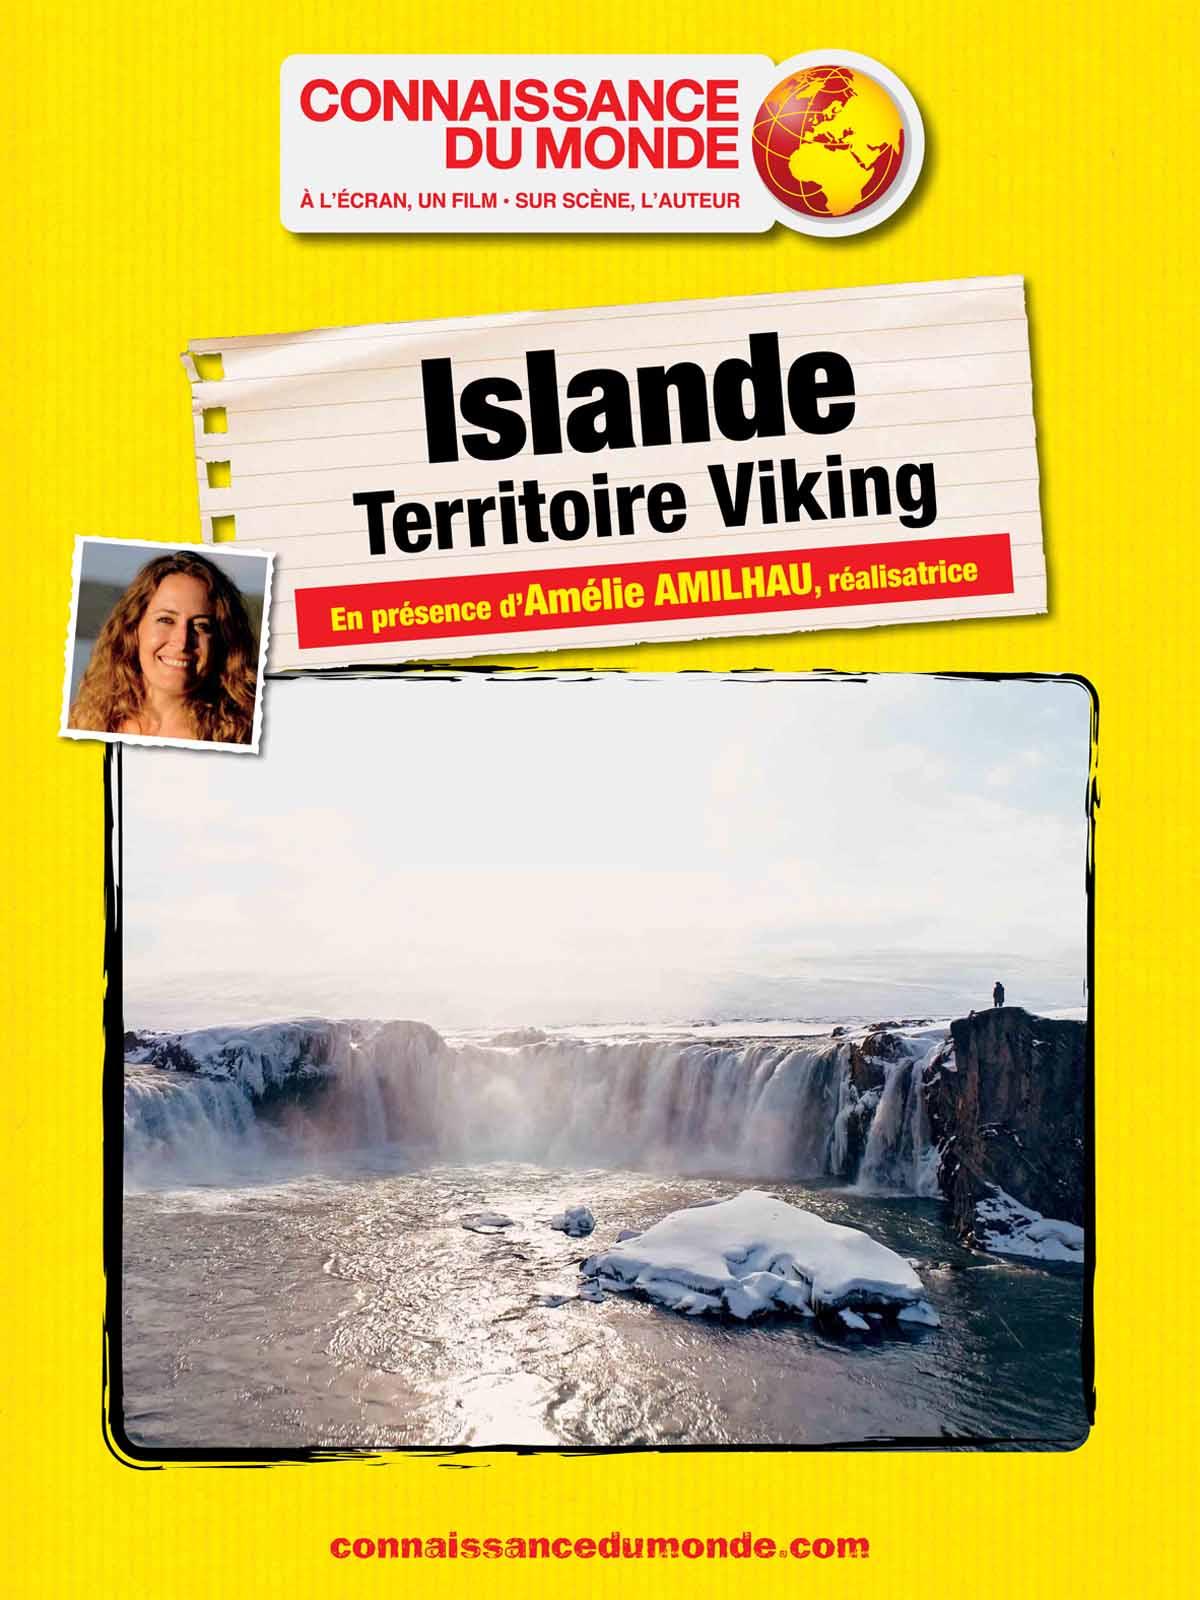 ISLANDE, Territoire Viking